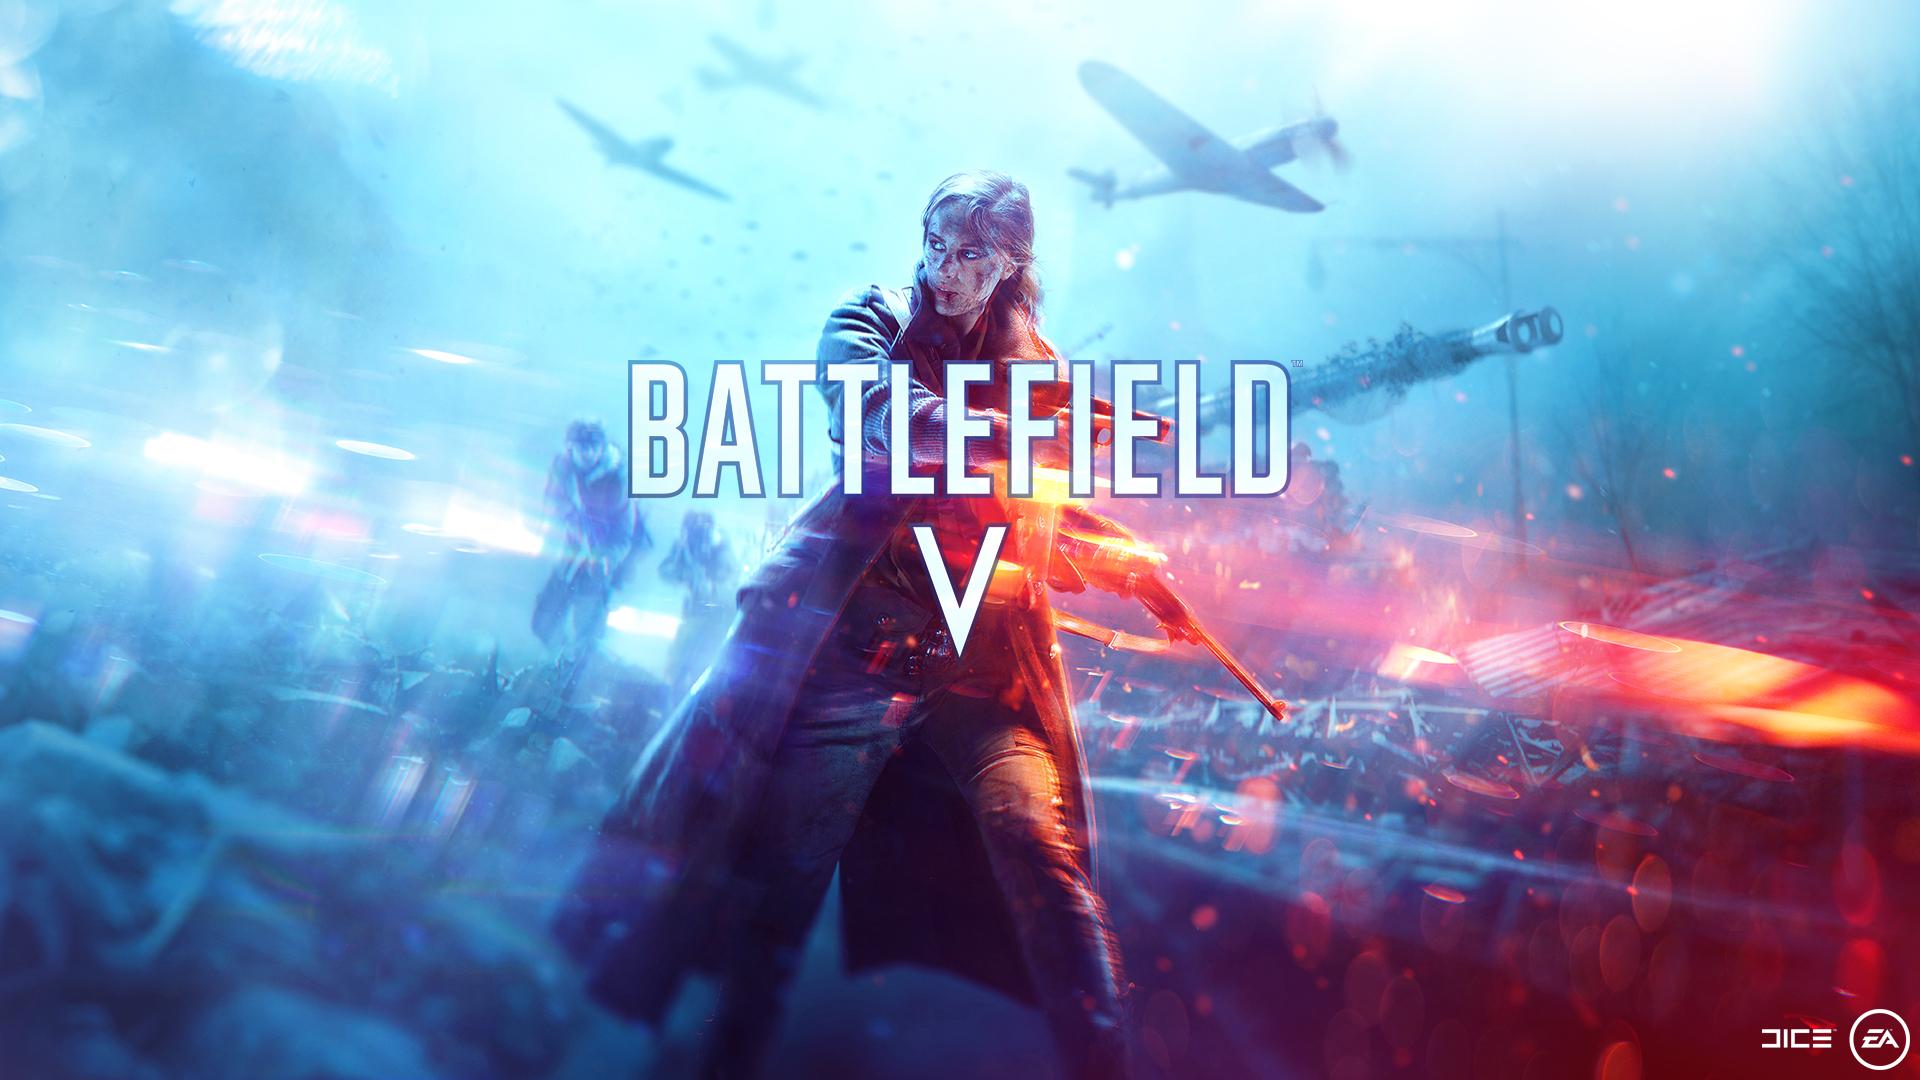 Battlefield V 5 Big Things You Need To Know Techradar